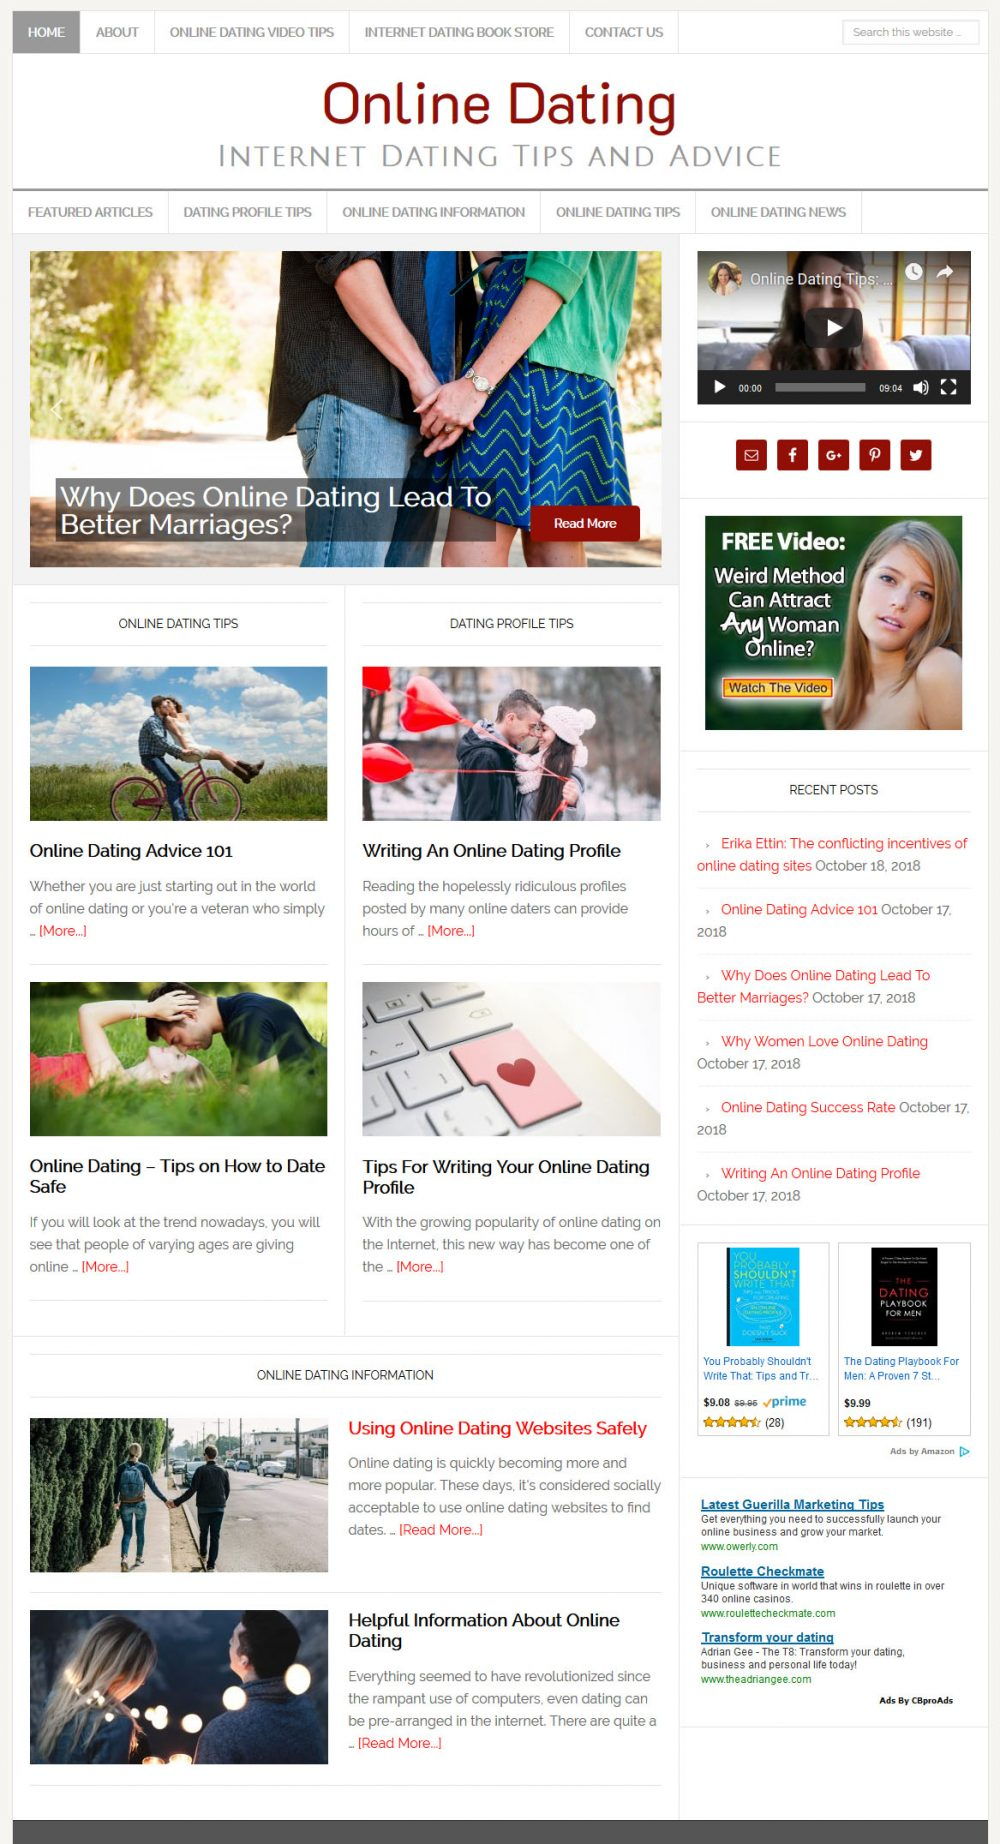 17 lehden online dating dating sivustoja Kanada